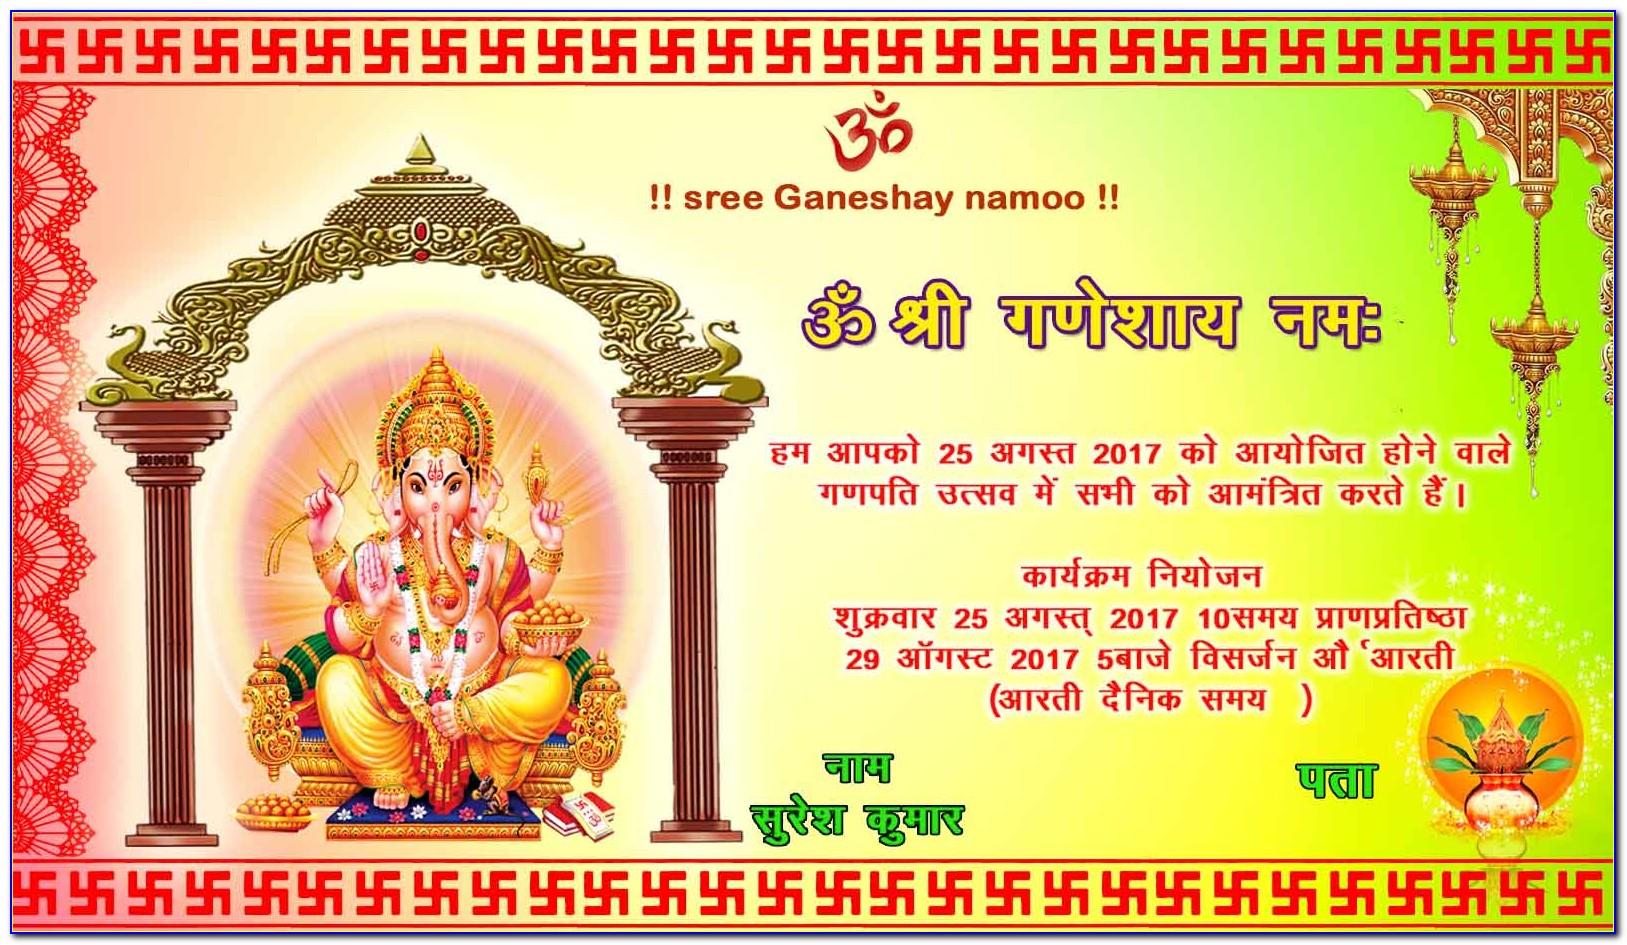 Ganesh Puja Invitation Card In English